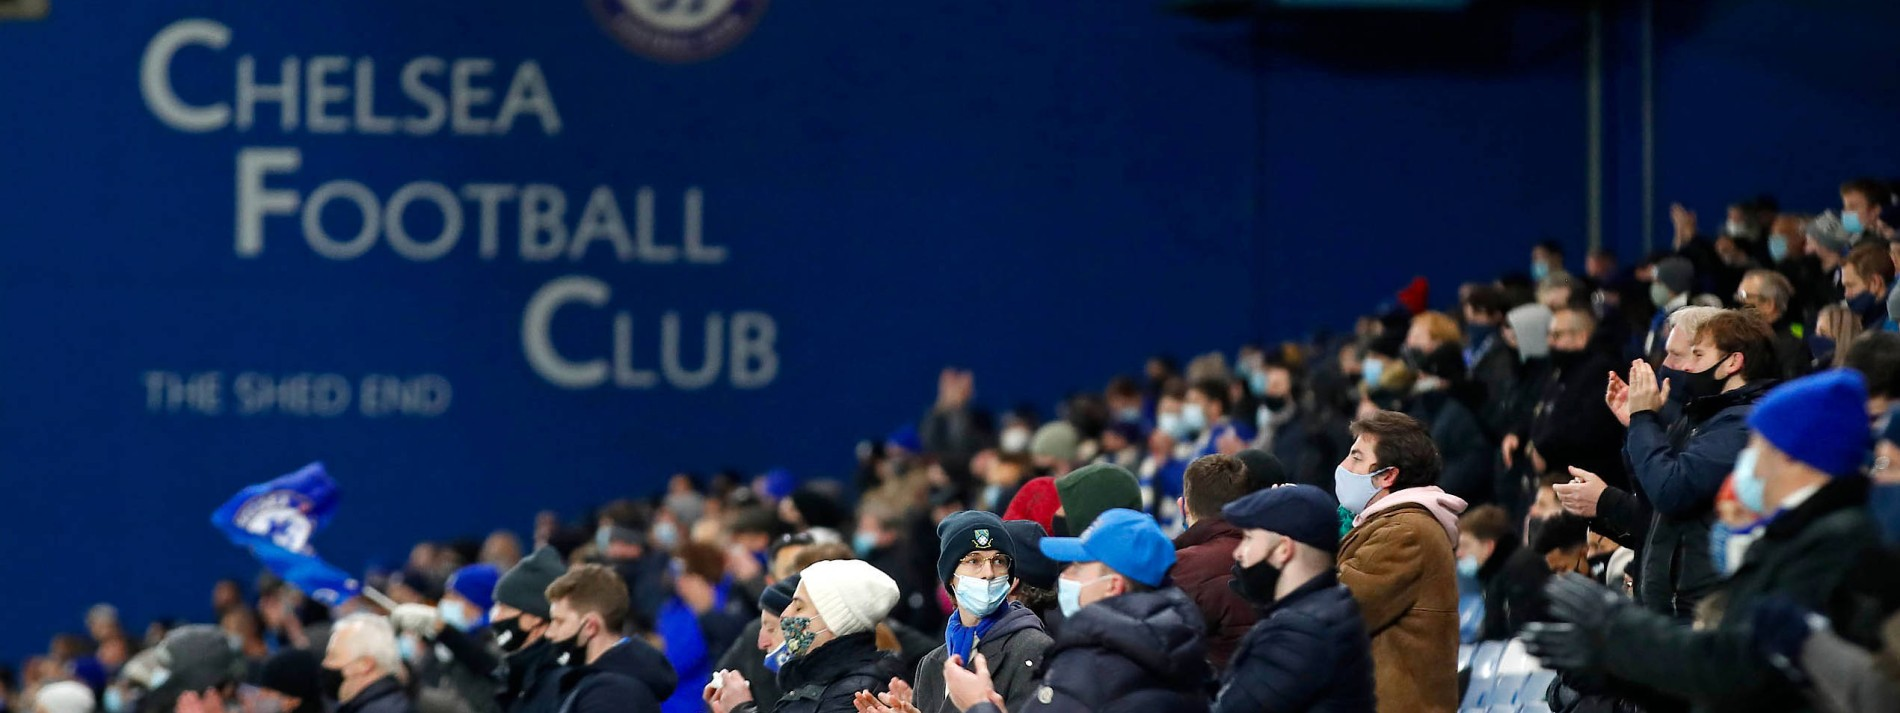 Premier League probt die Rückkehr der Fans